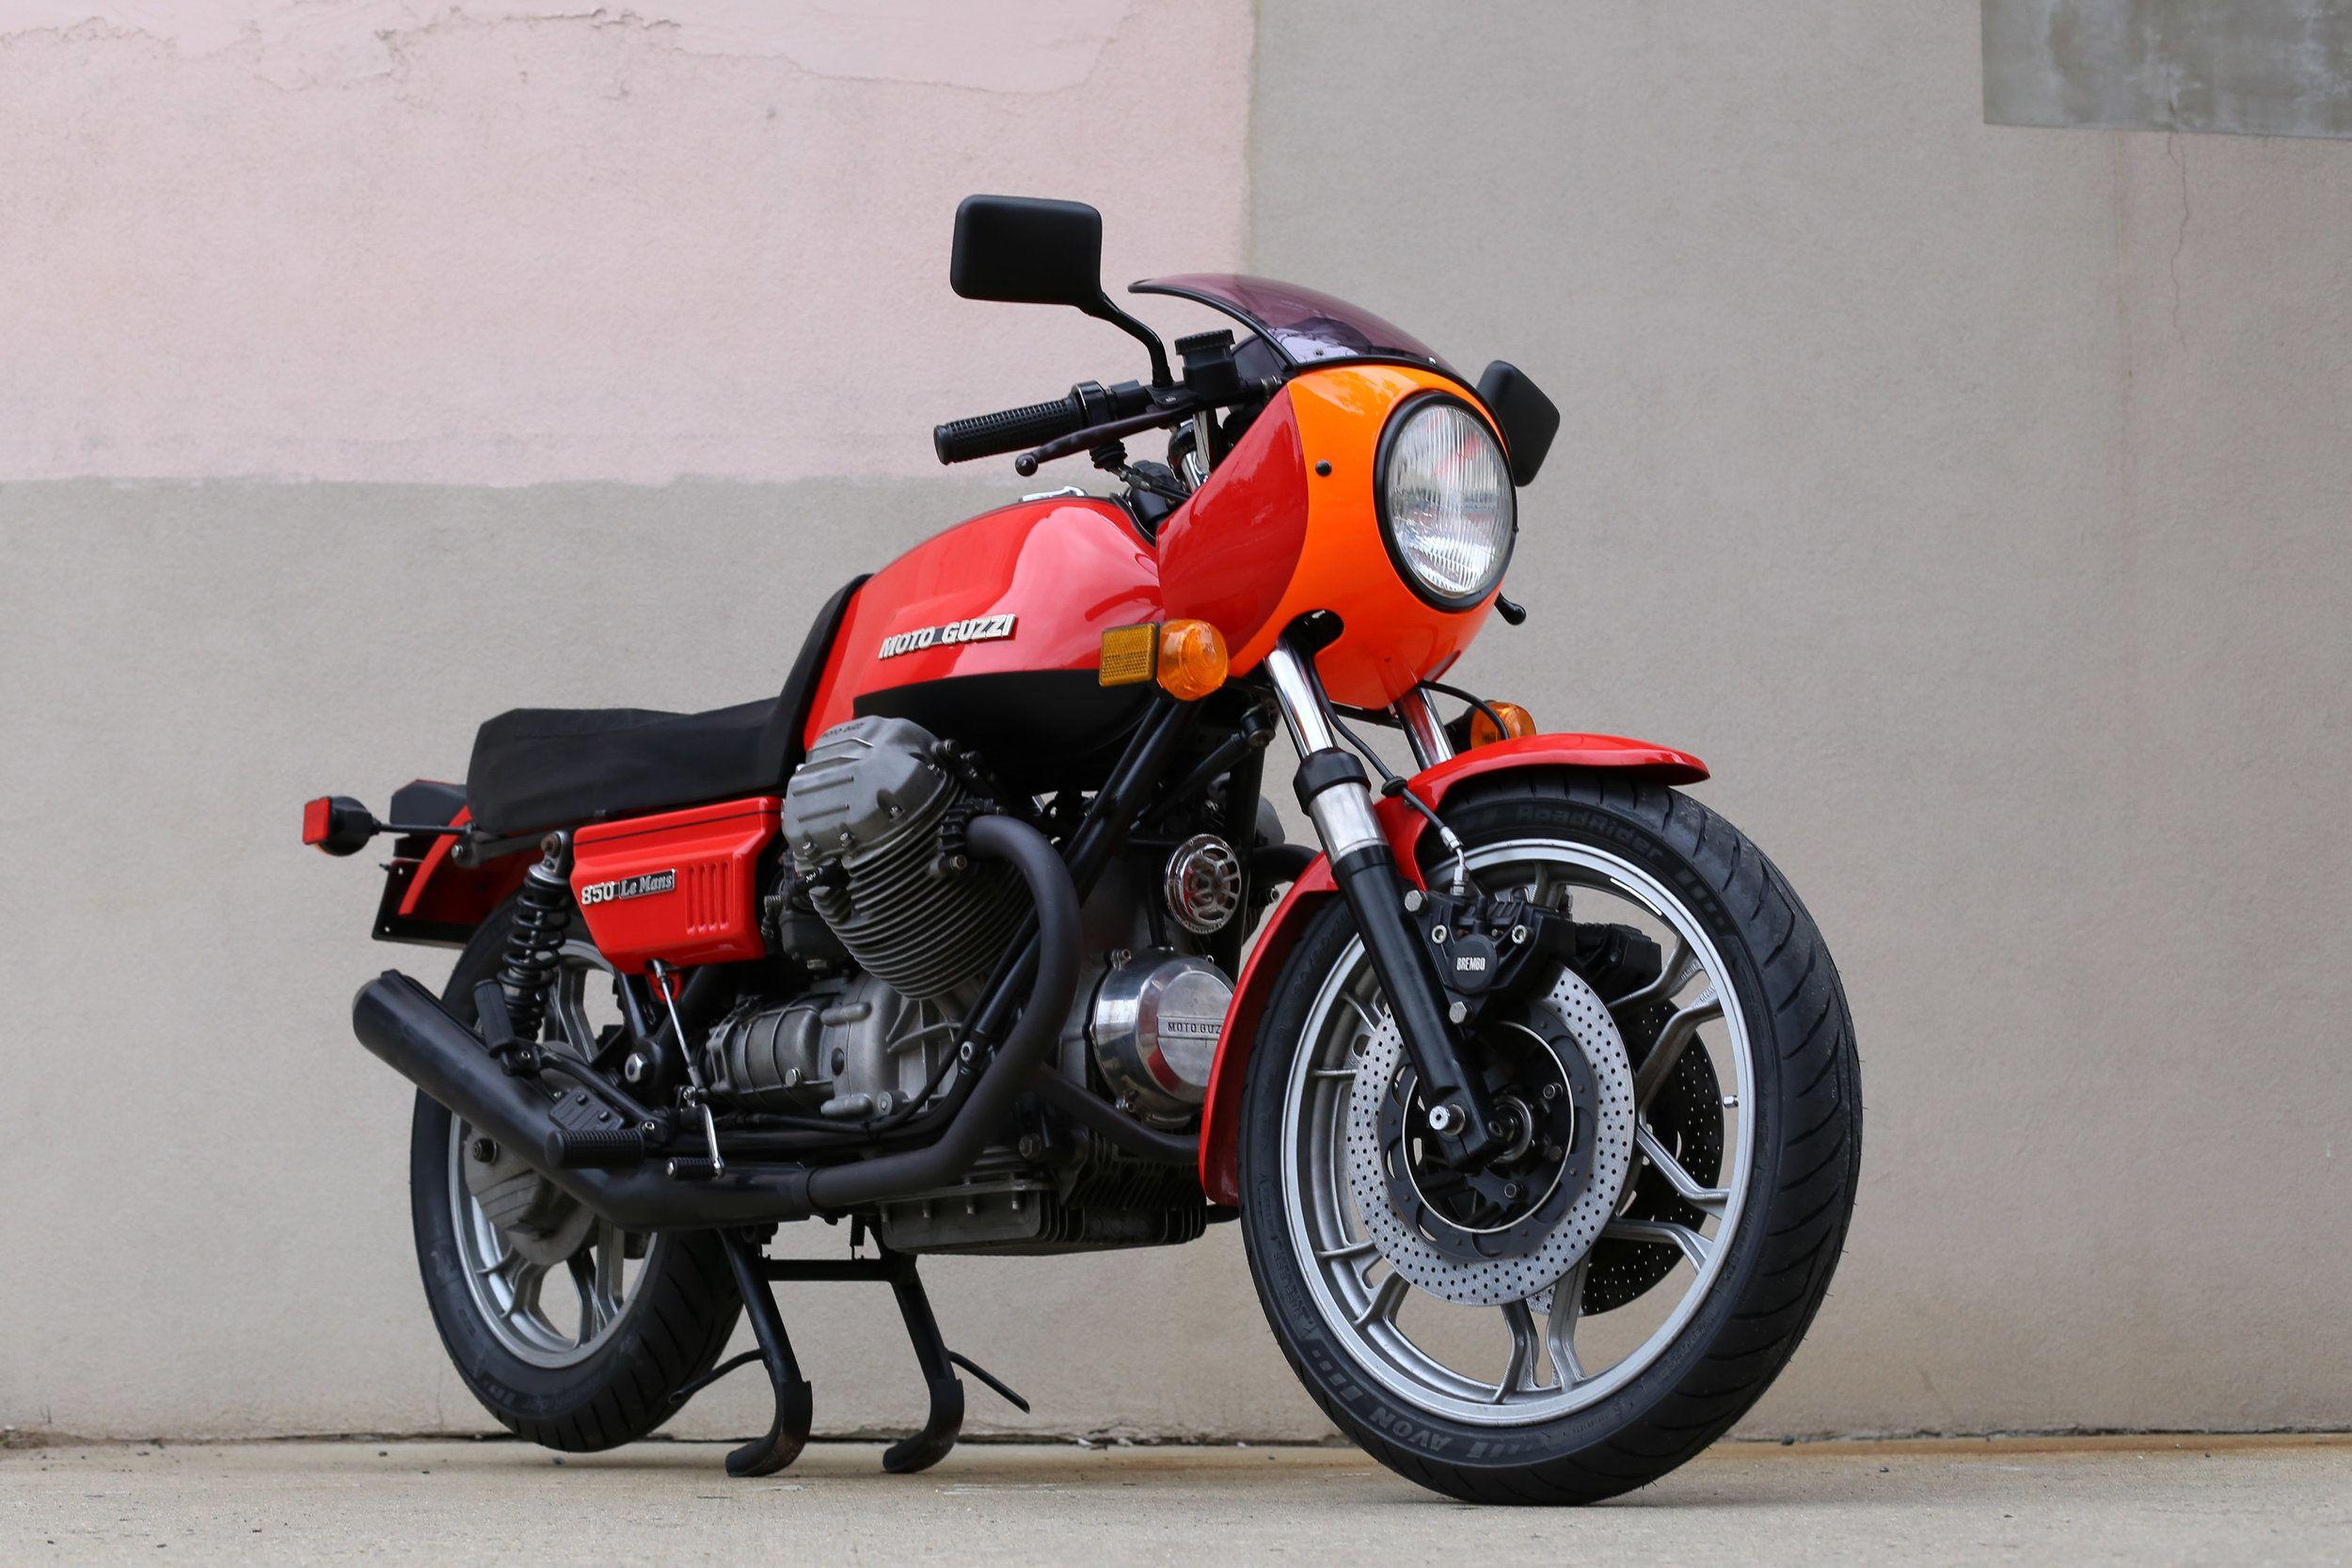 1977 Moto Guzzi Lemans 1 Moto Guzzi Moto Guzzi Cafe Racer Moto Guzzi Motorcycles